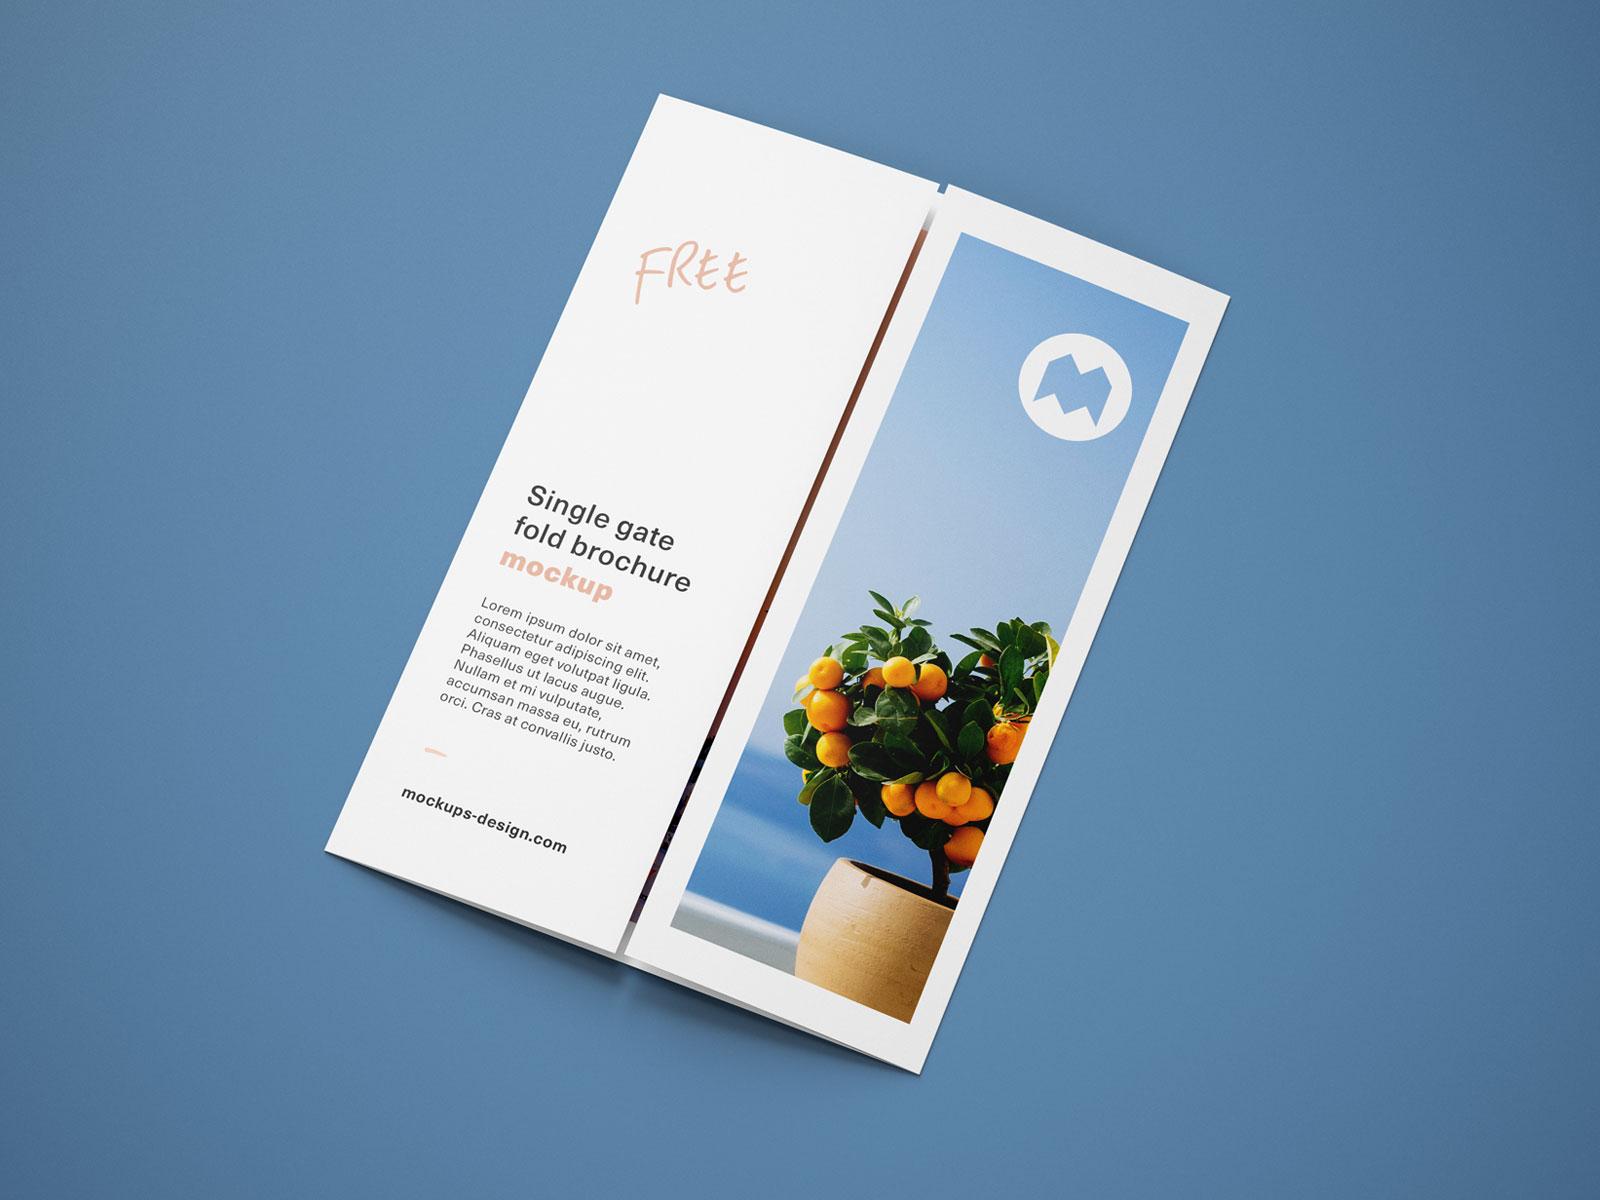 Free-Single-Gate-Fold-Brochure-Mockup-PSD-Set-9